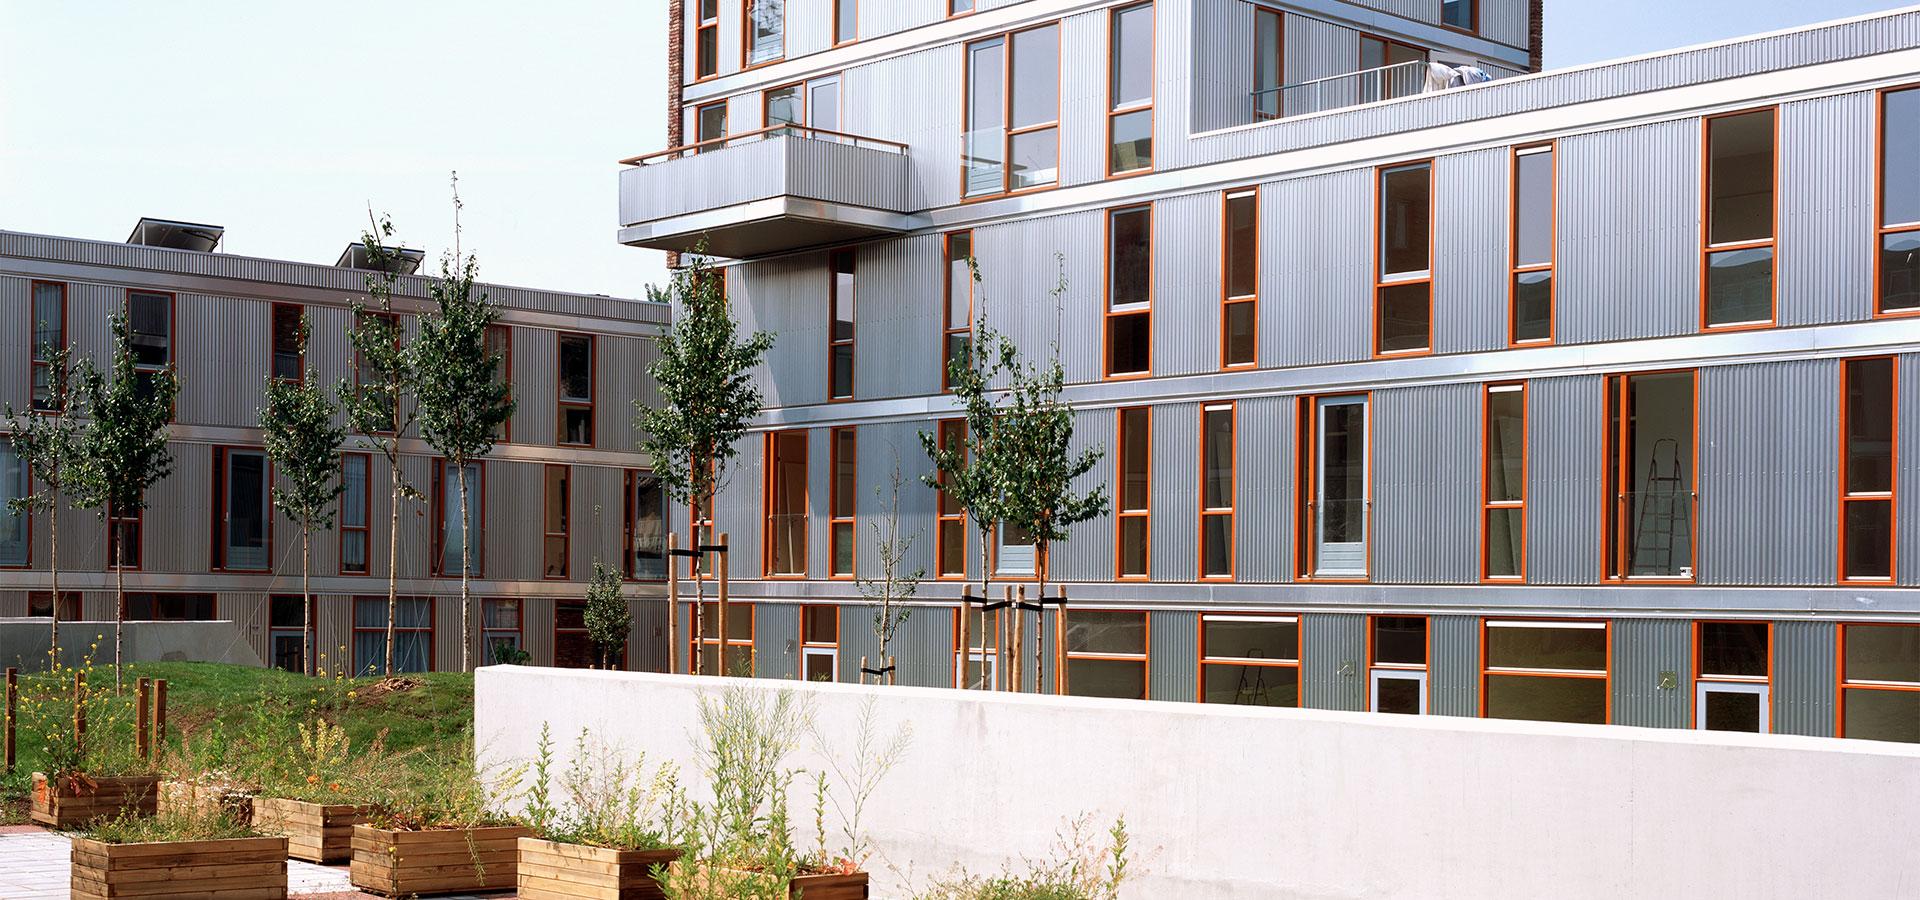 FARO architecten Geuzentuinen Amsterdam 01